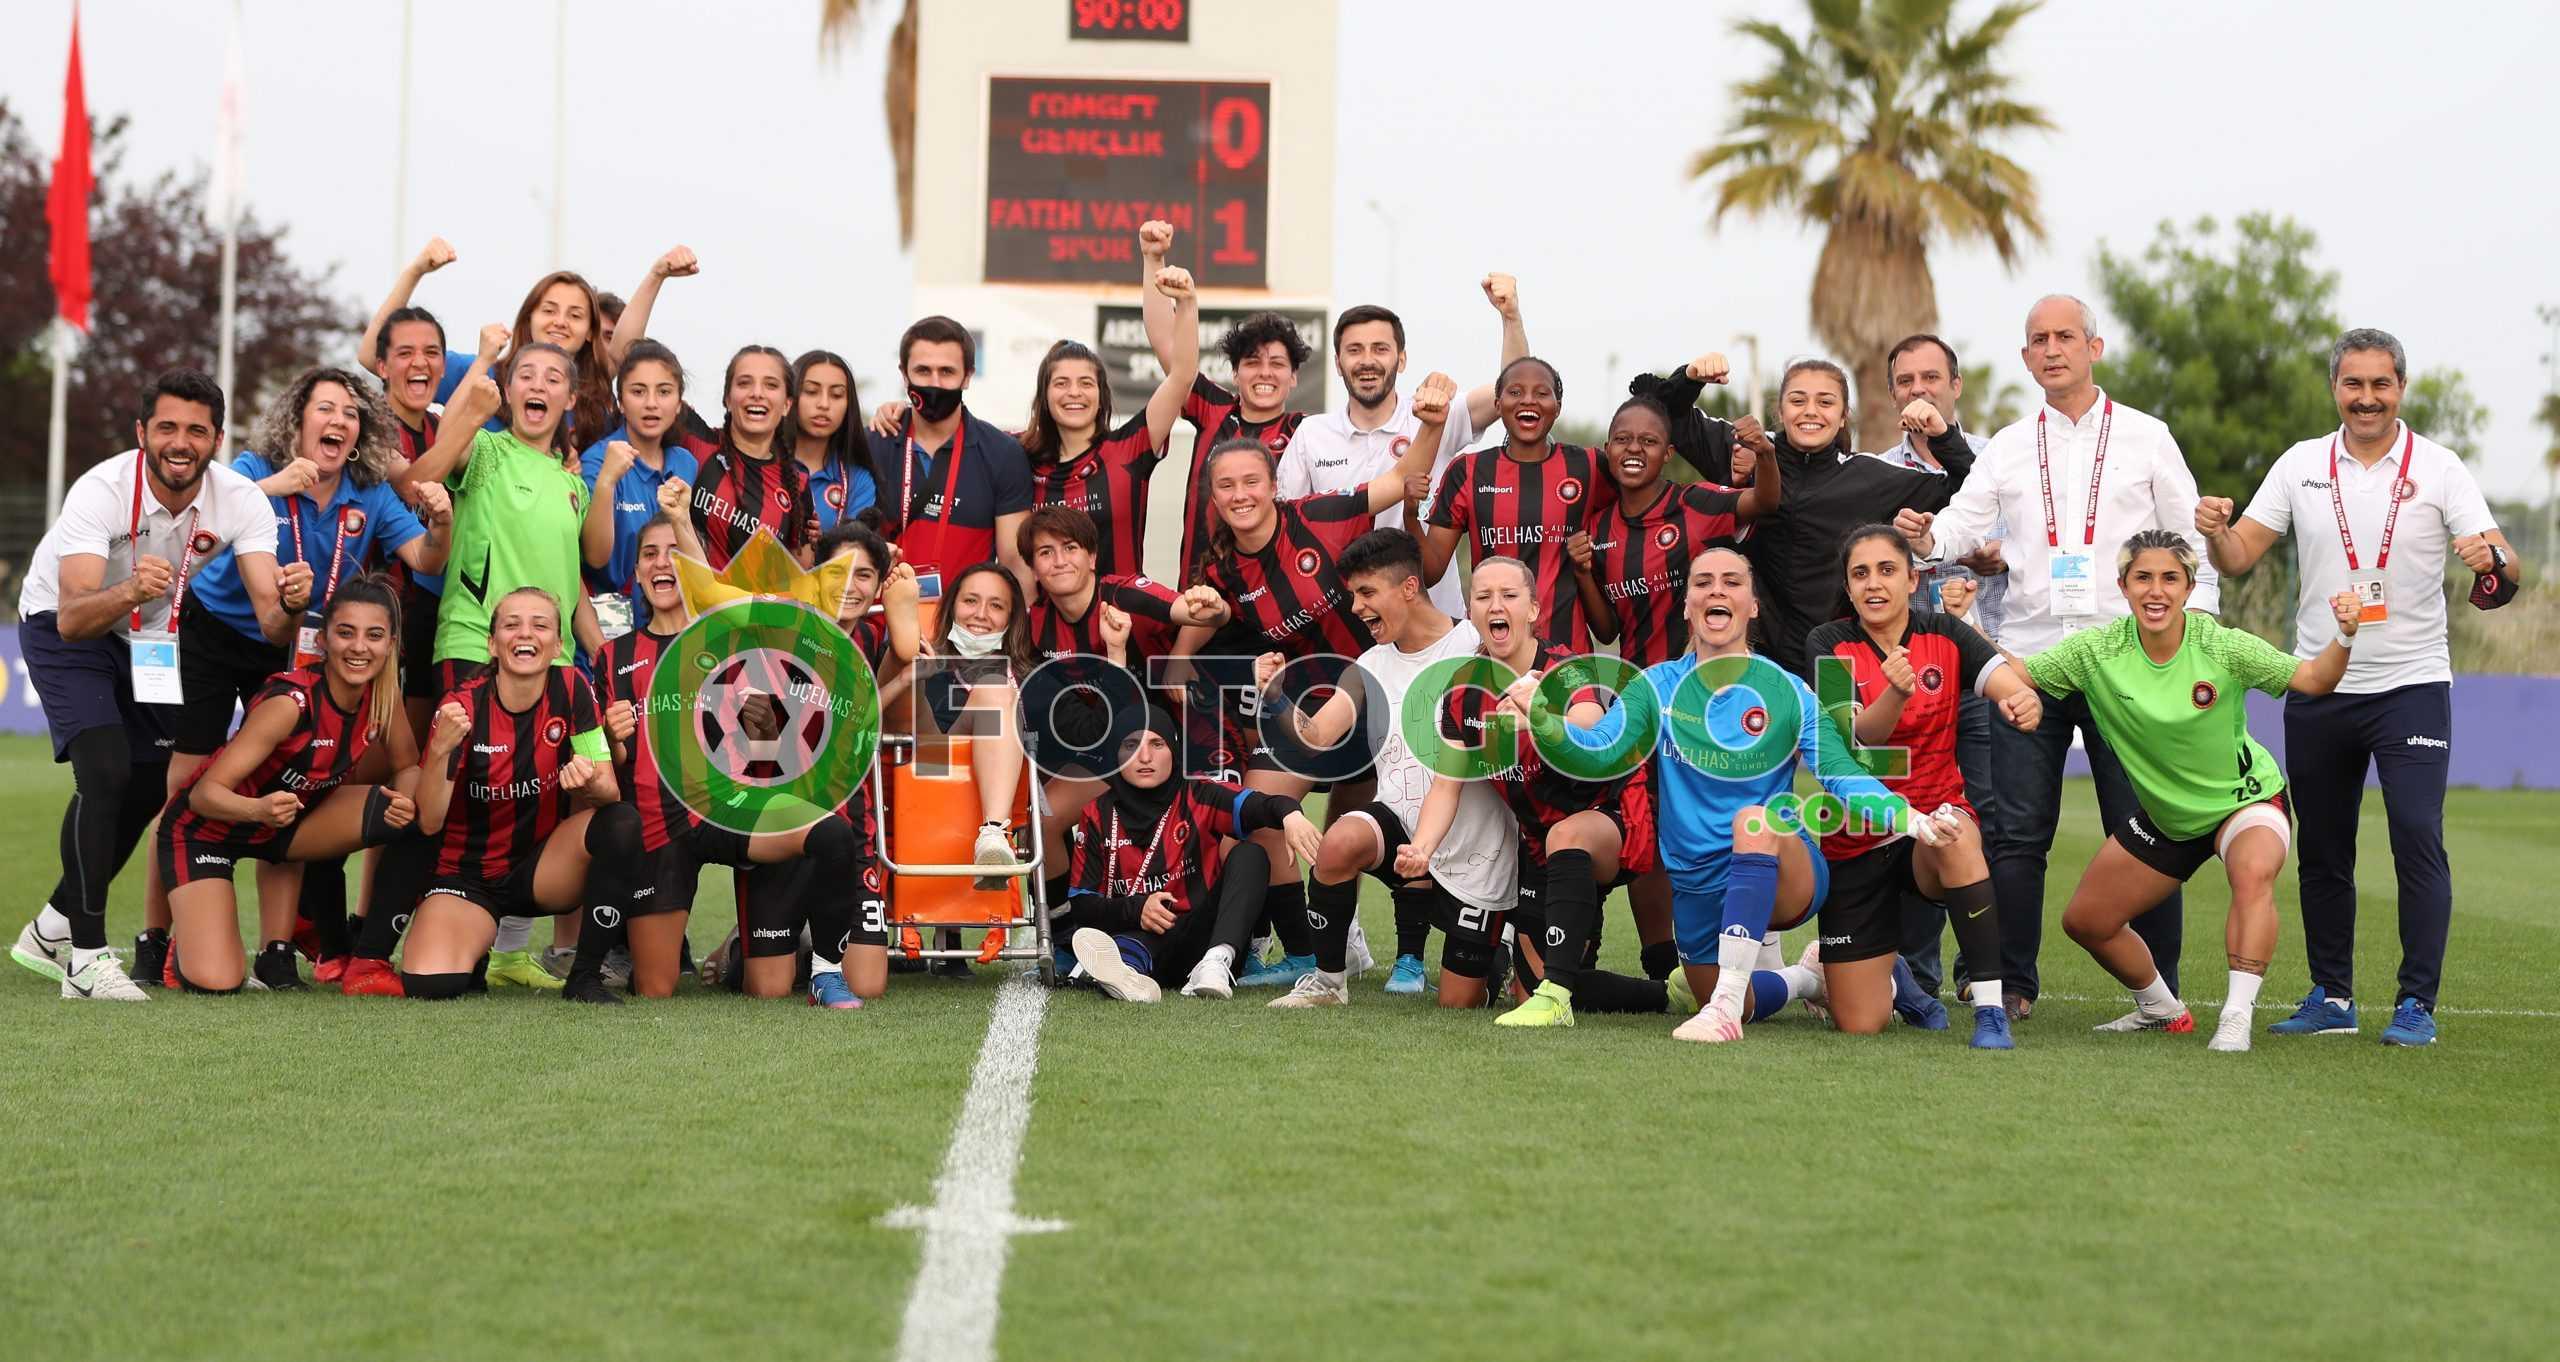 Fatih vatan Finalde  1-0